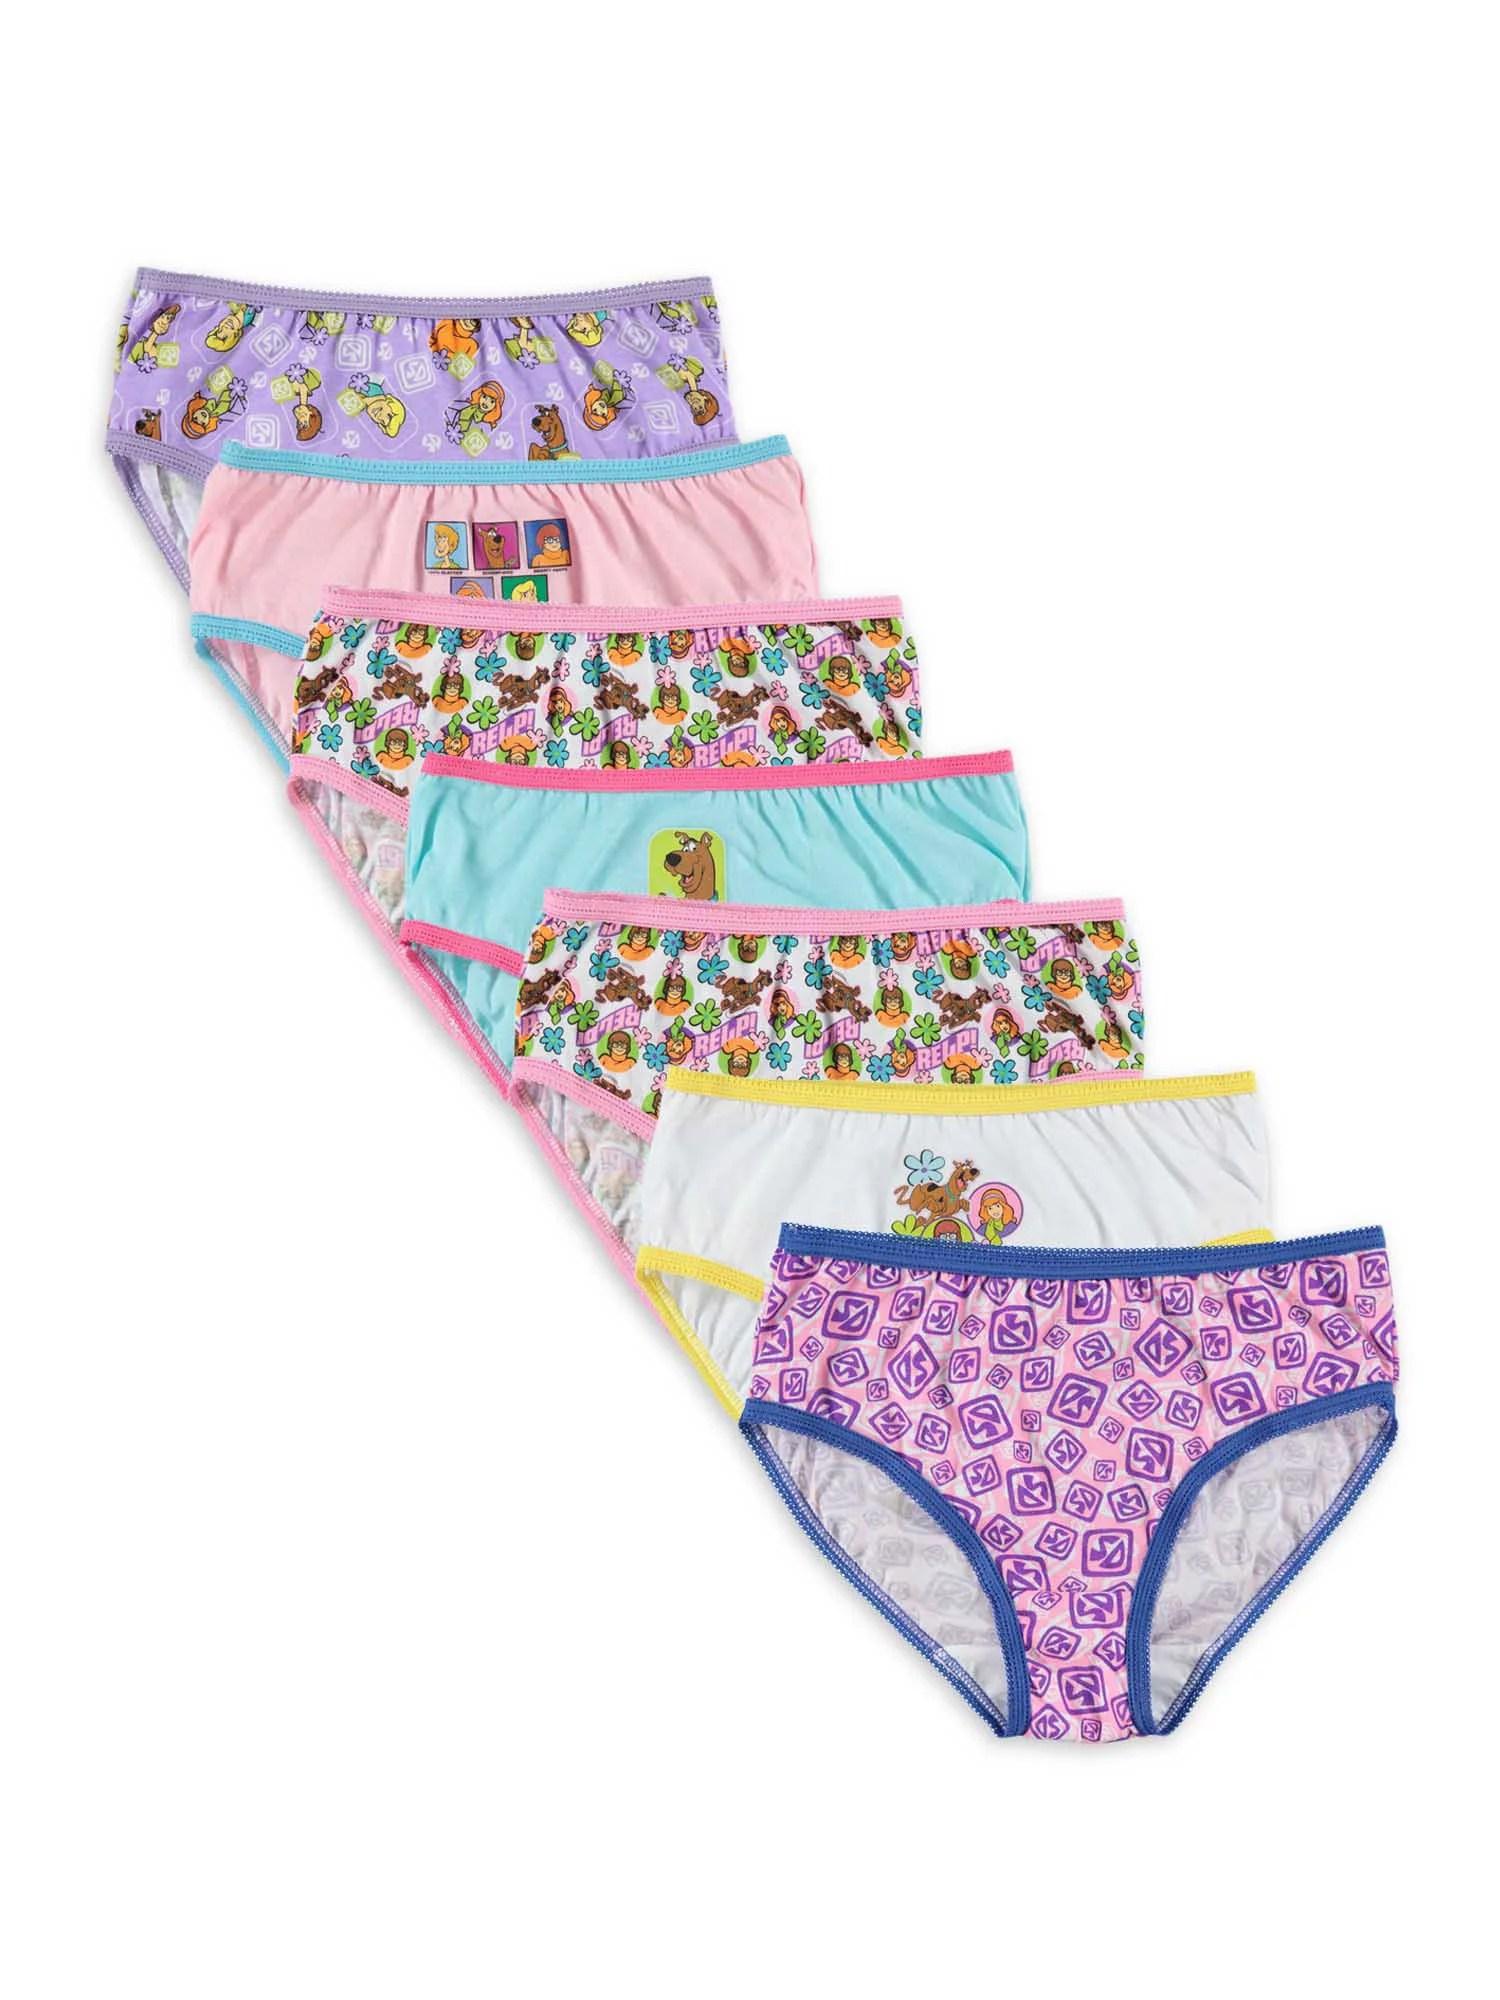 Images Of Girls In Panties : images, girls, panties, Scooby-Doo, Scooby-Doo,, Girls, Underwear,, Panties,, Sizes, Walmart.com